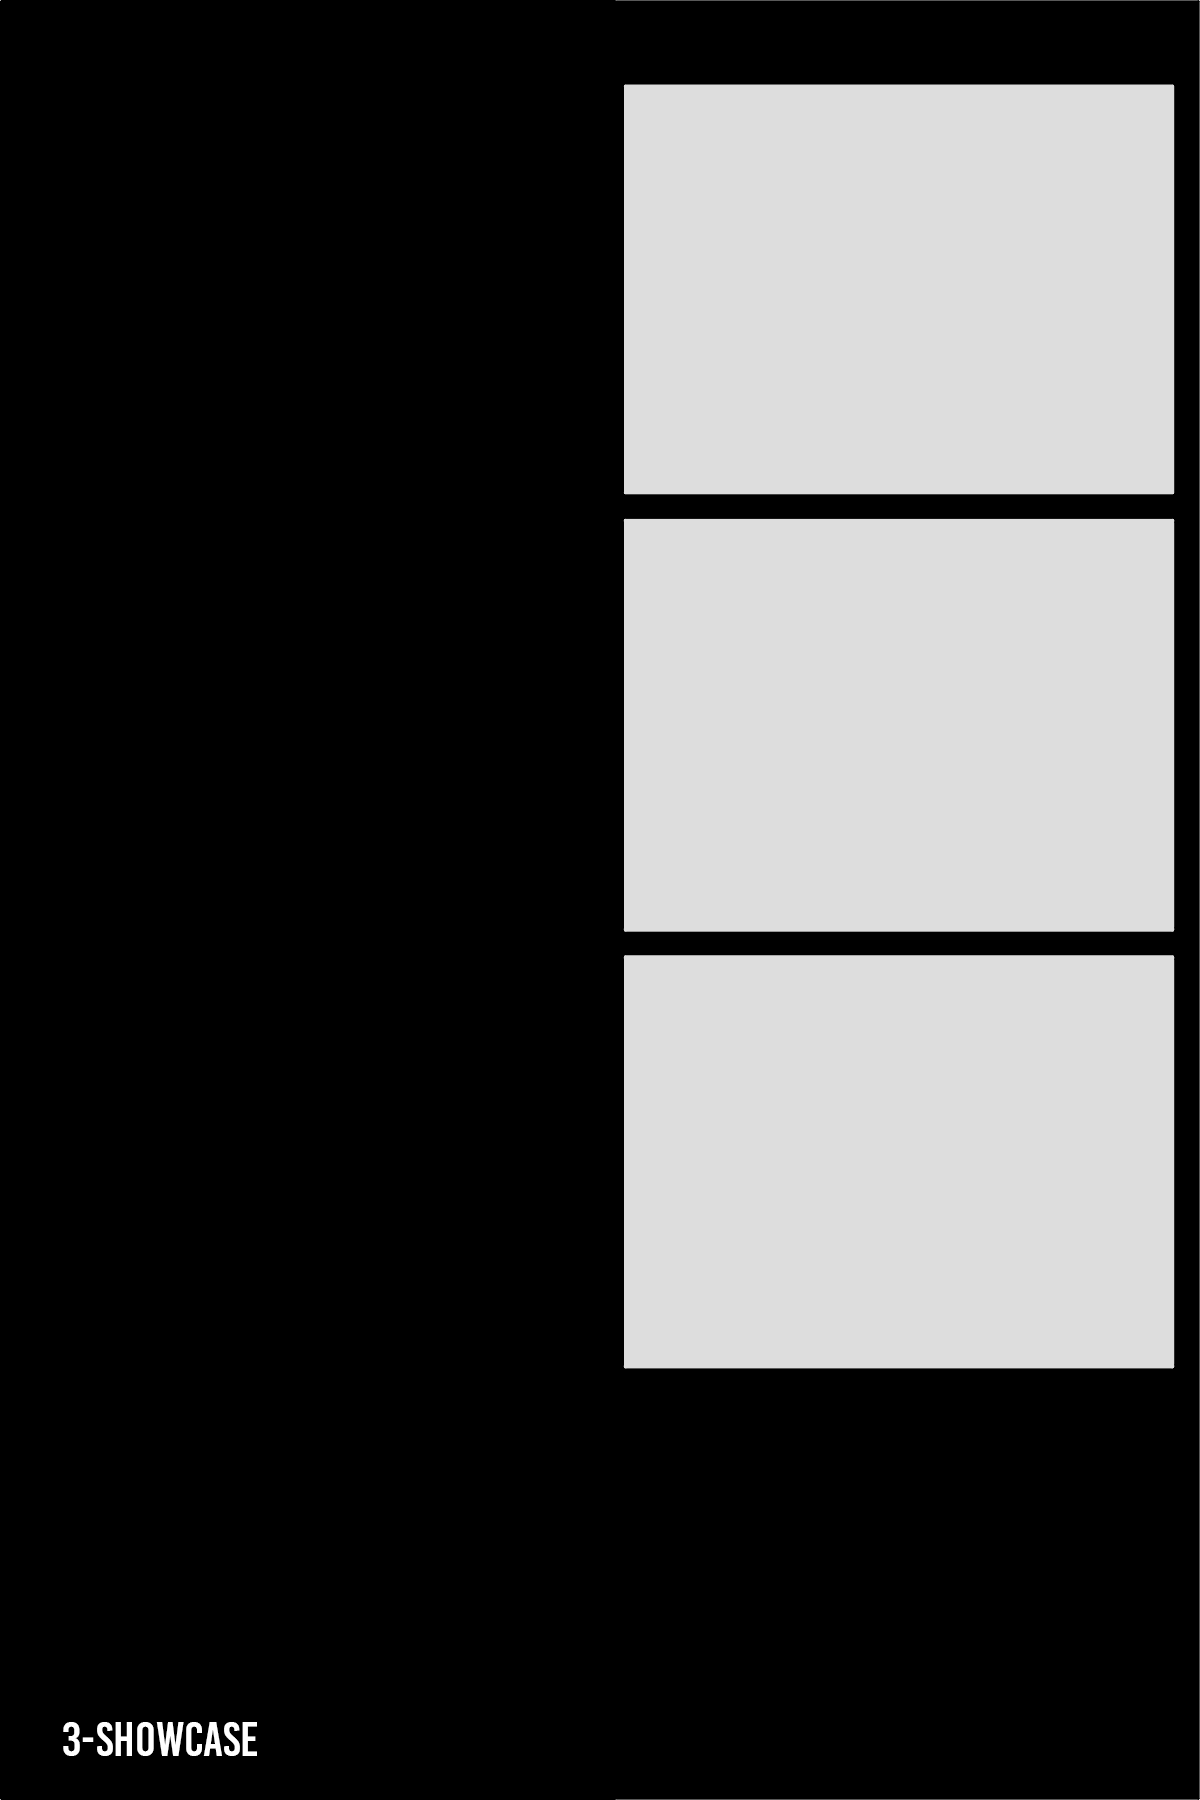 3-showcase